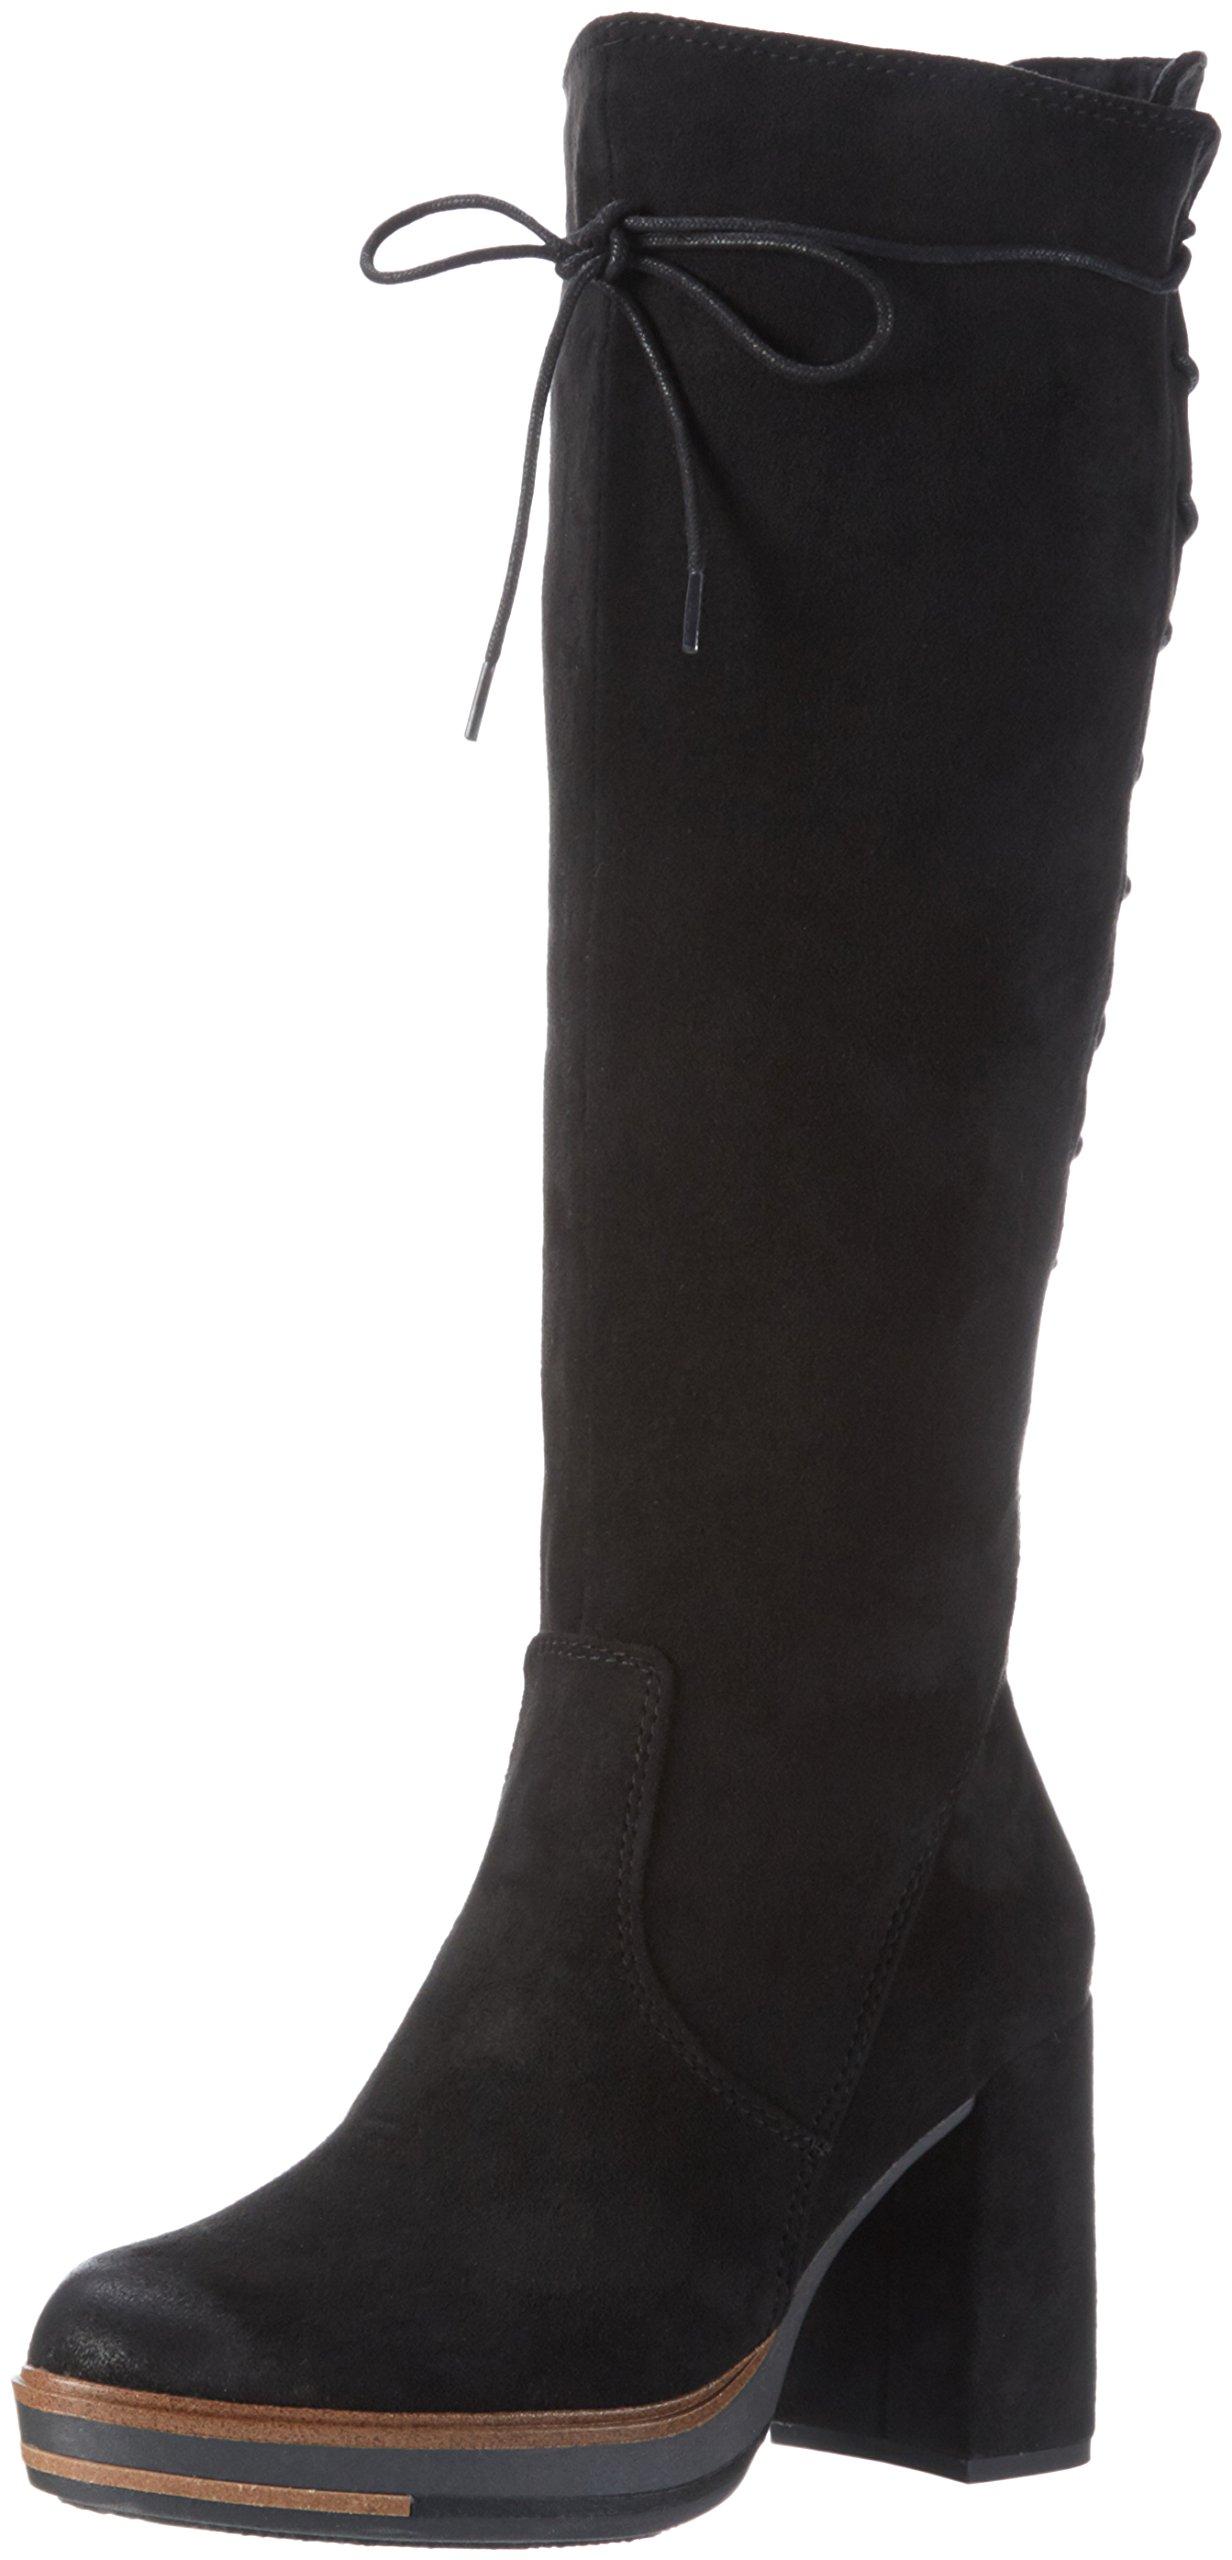 Black longues 002 Noir Bottes Antic 37 Femme 25639 Tozzi EU Marco B1qwPpq